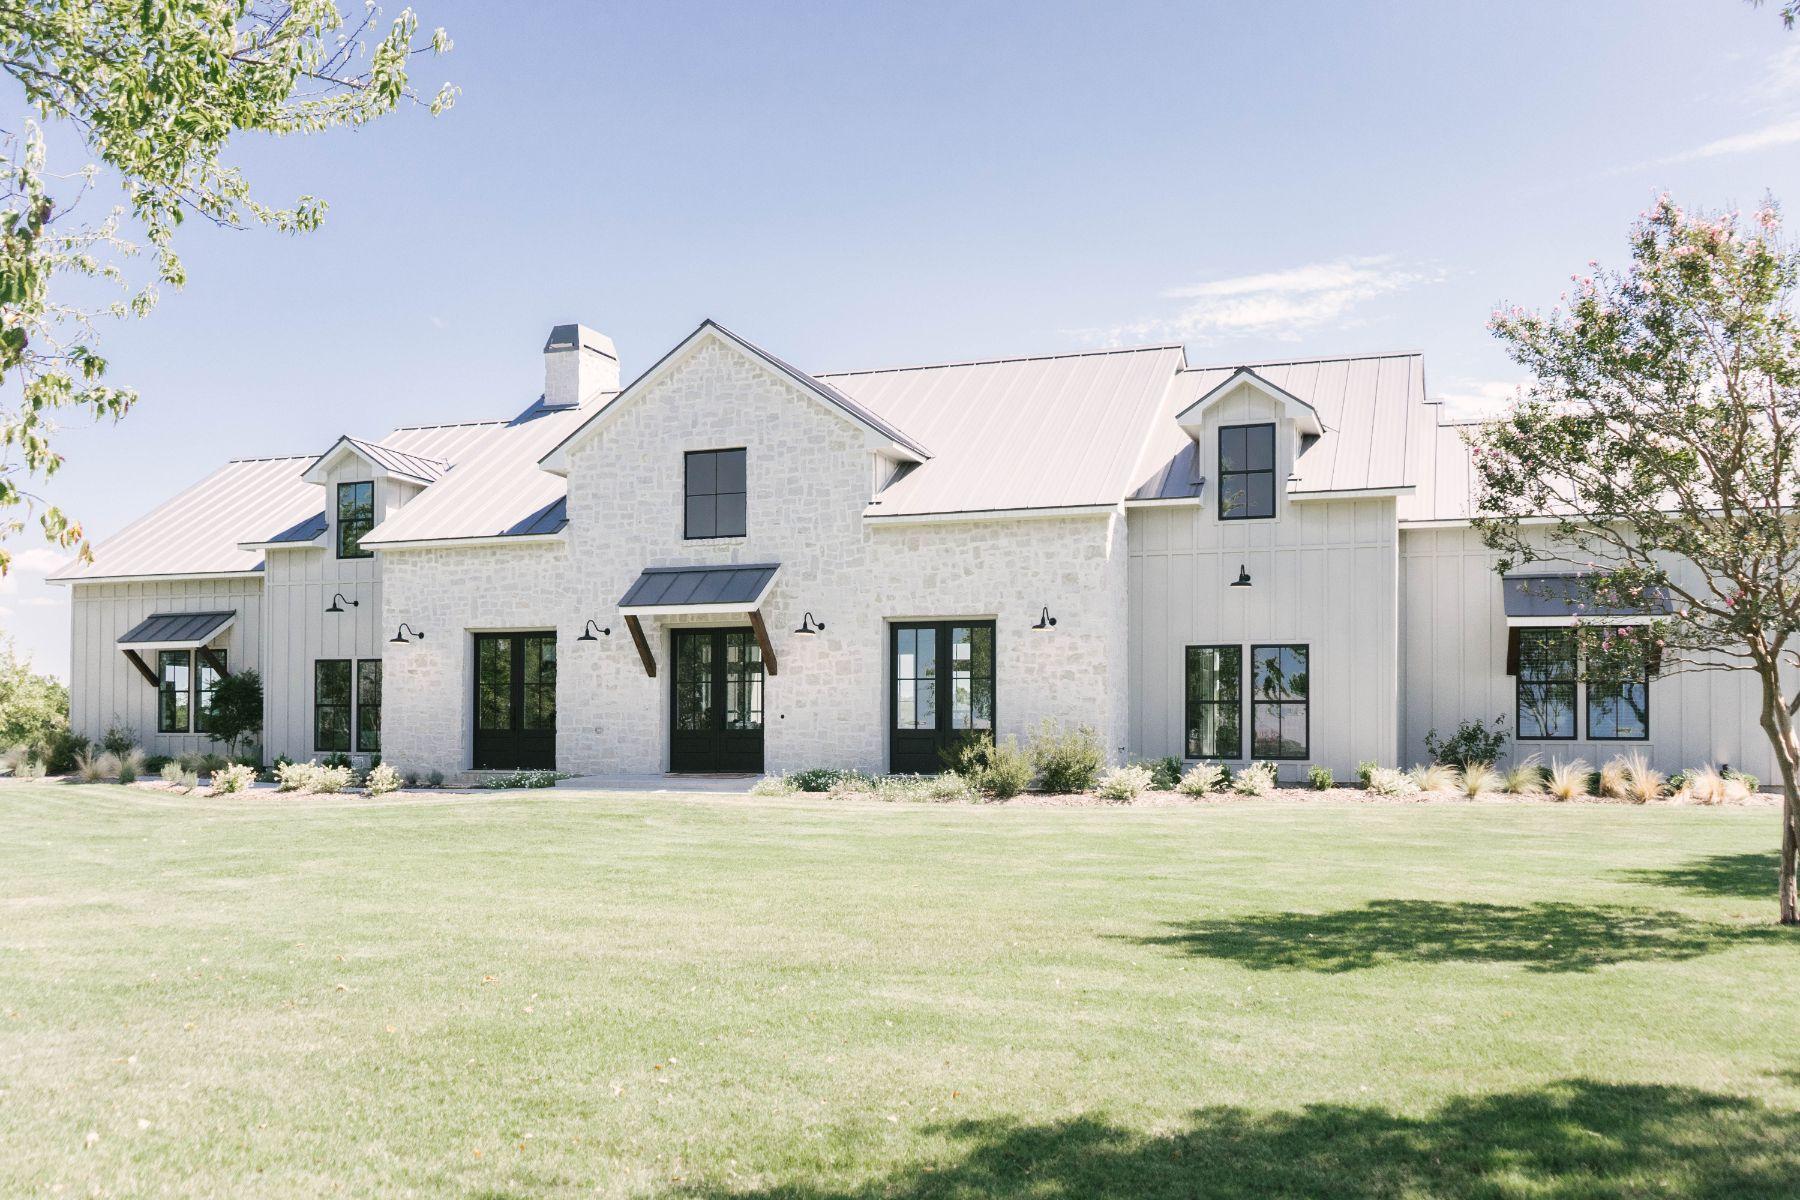 Texas Forever Farmhouse - Home Tour-03099.jpg